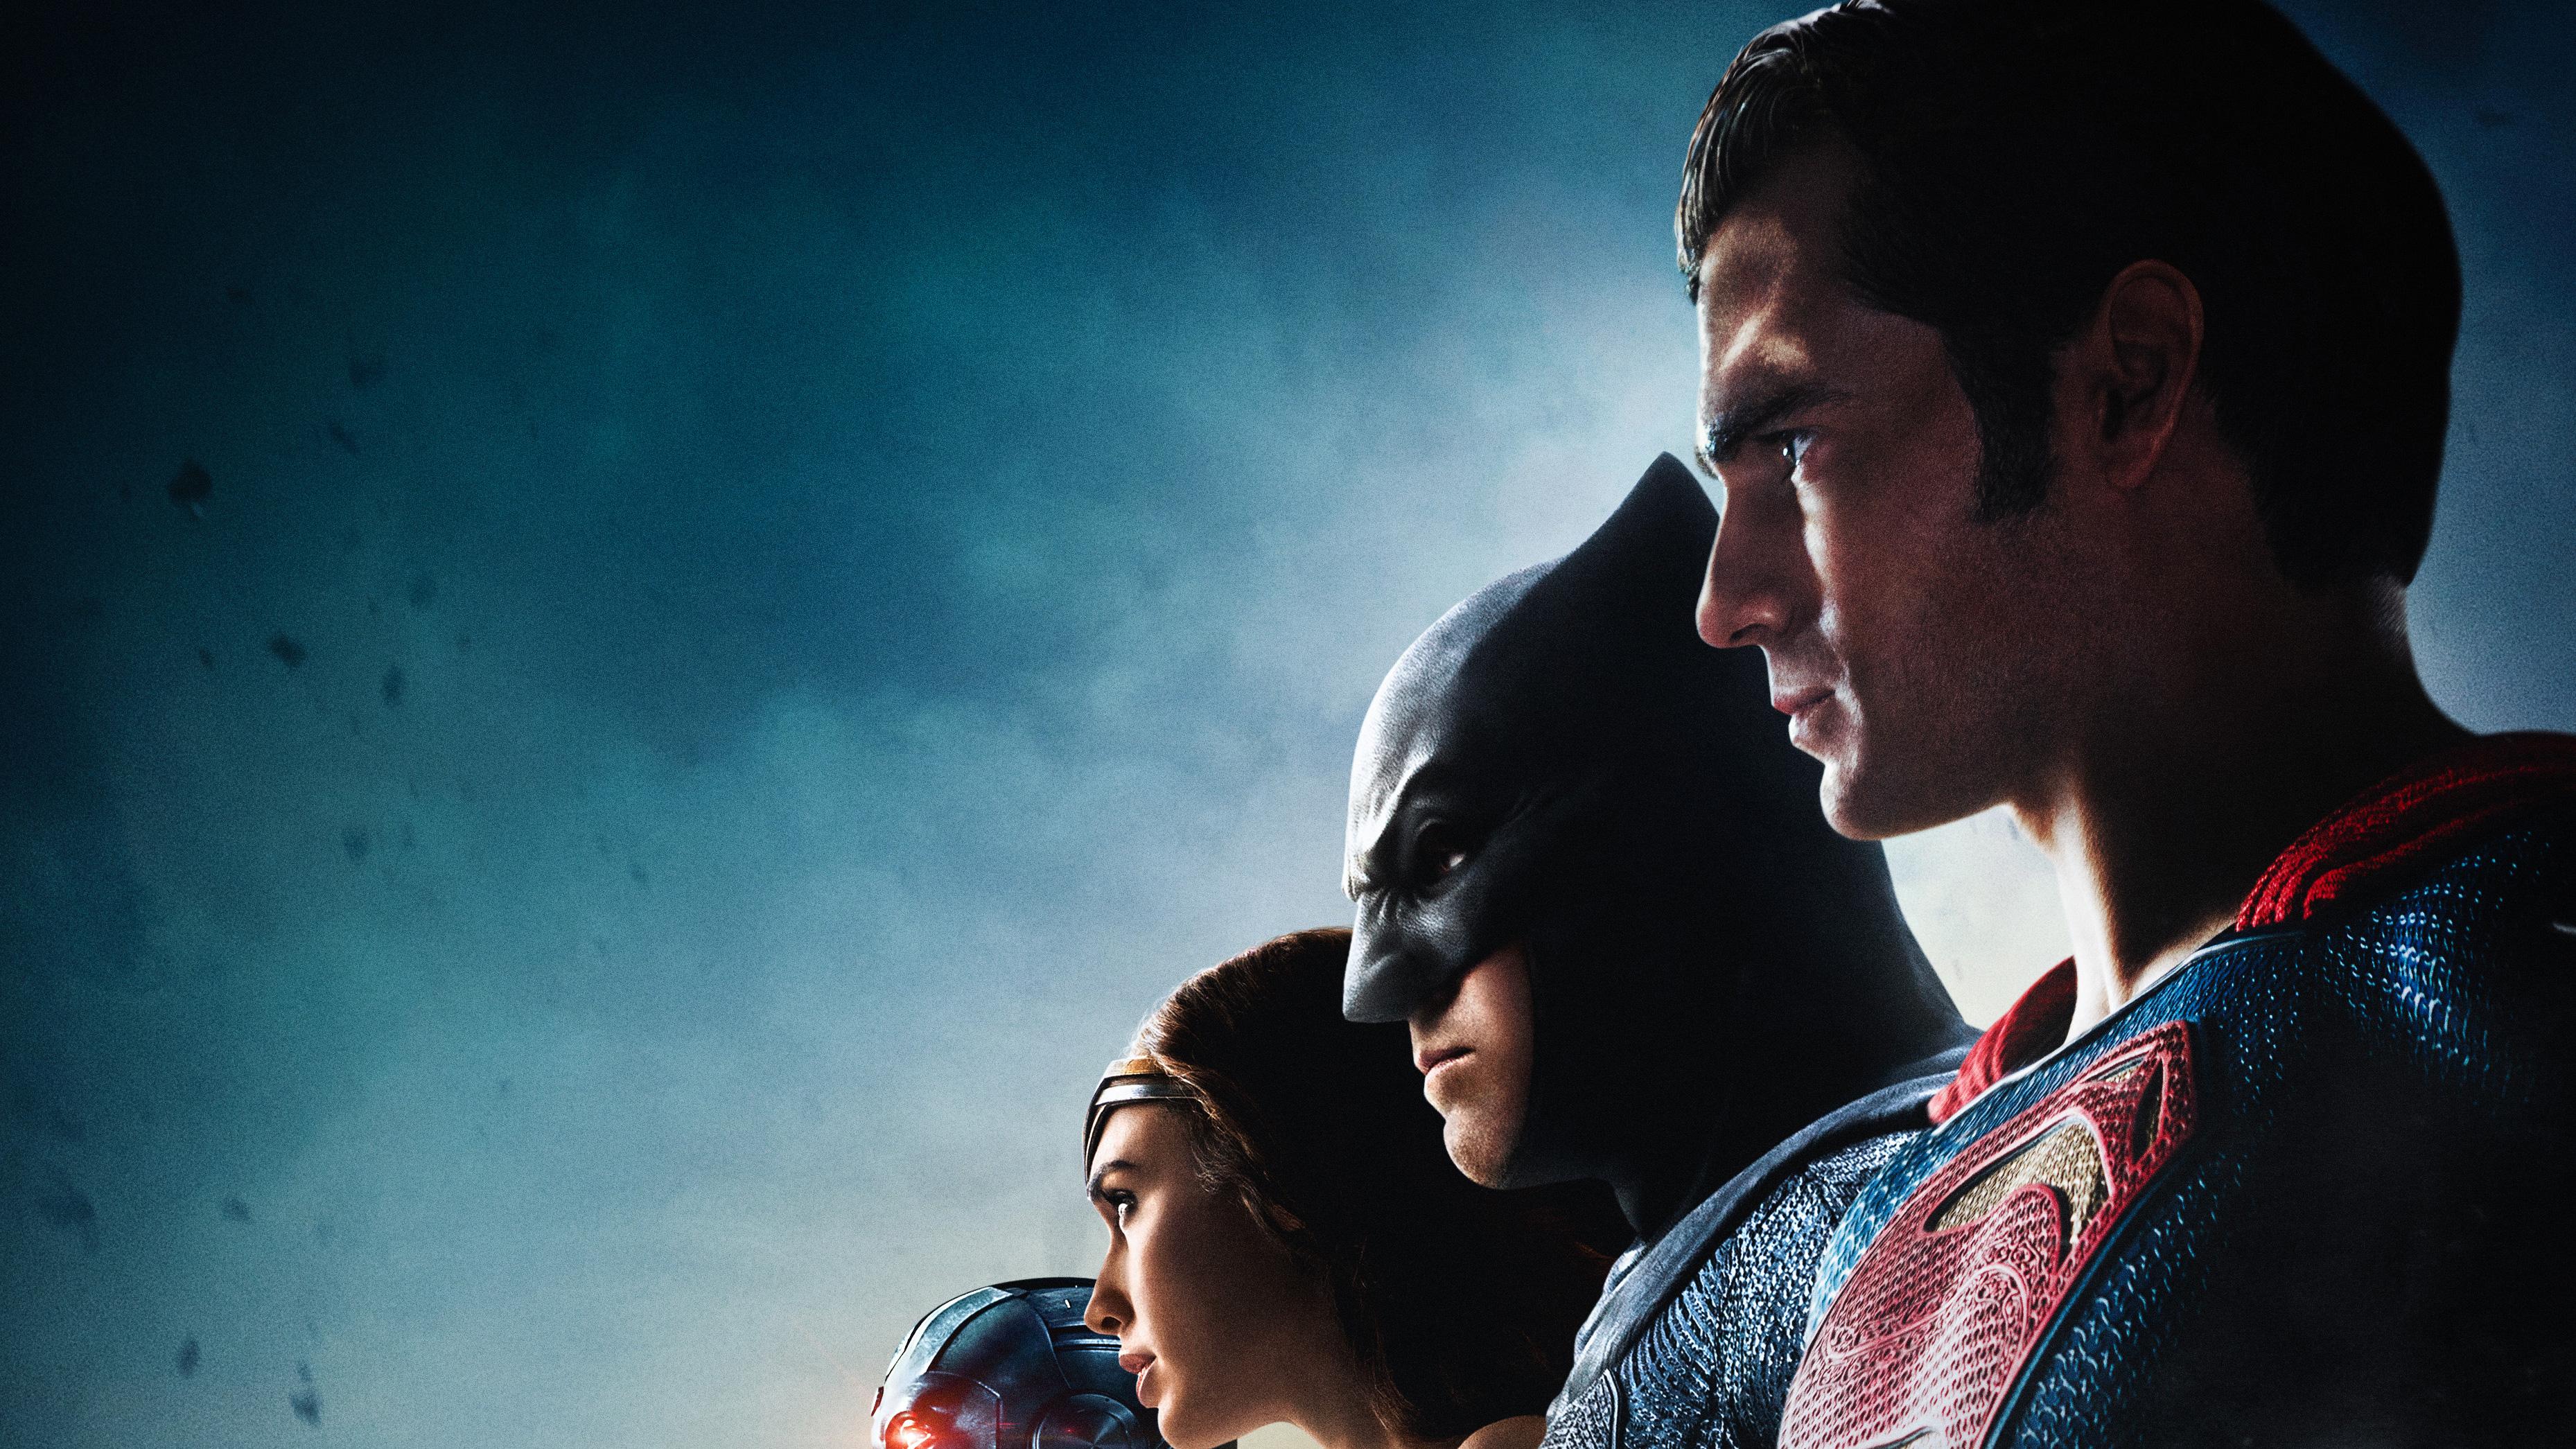 Superman Batman Wonder Woman Justice League 4k Hd Movies